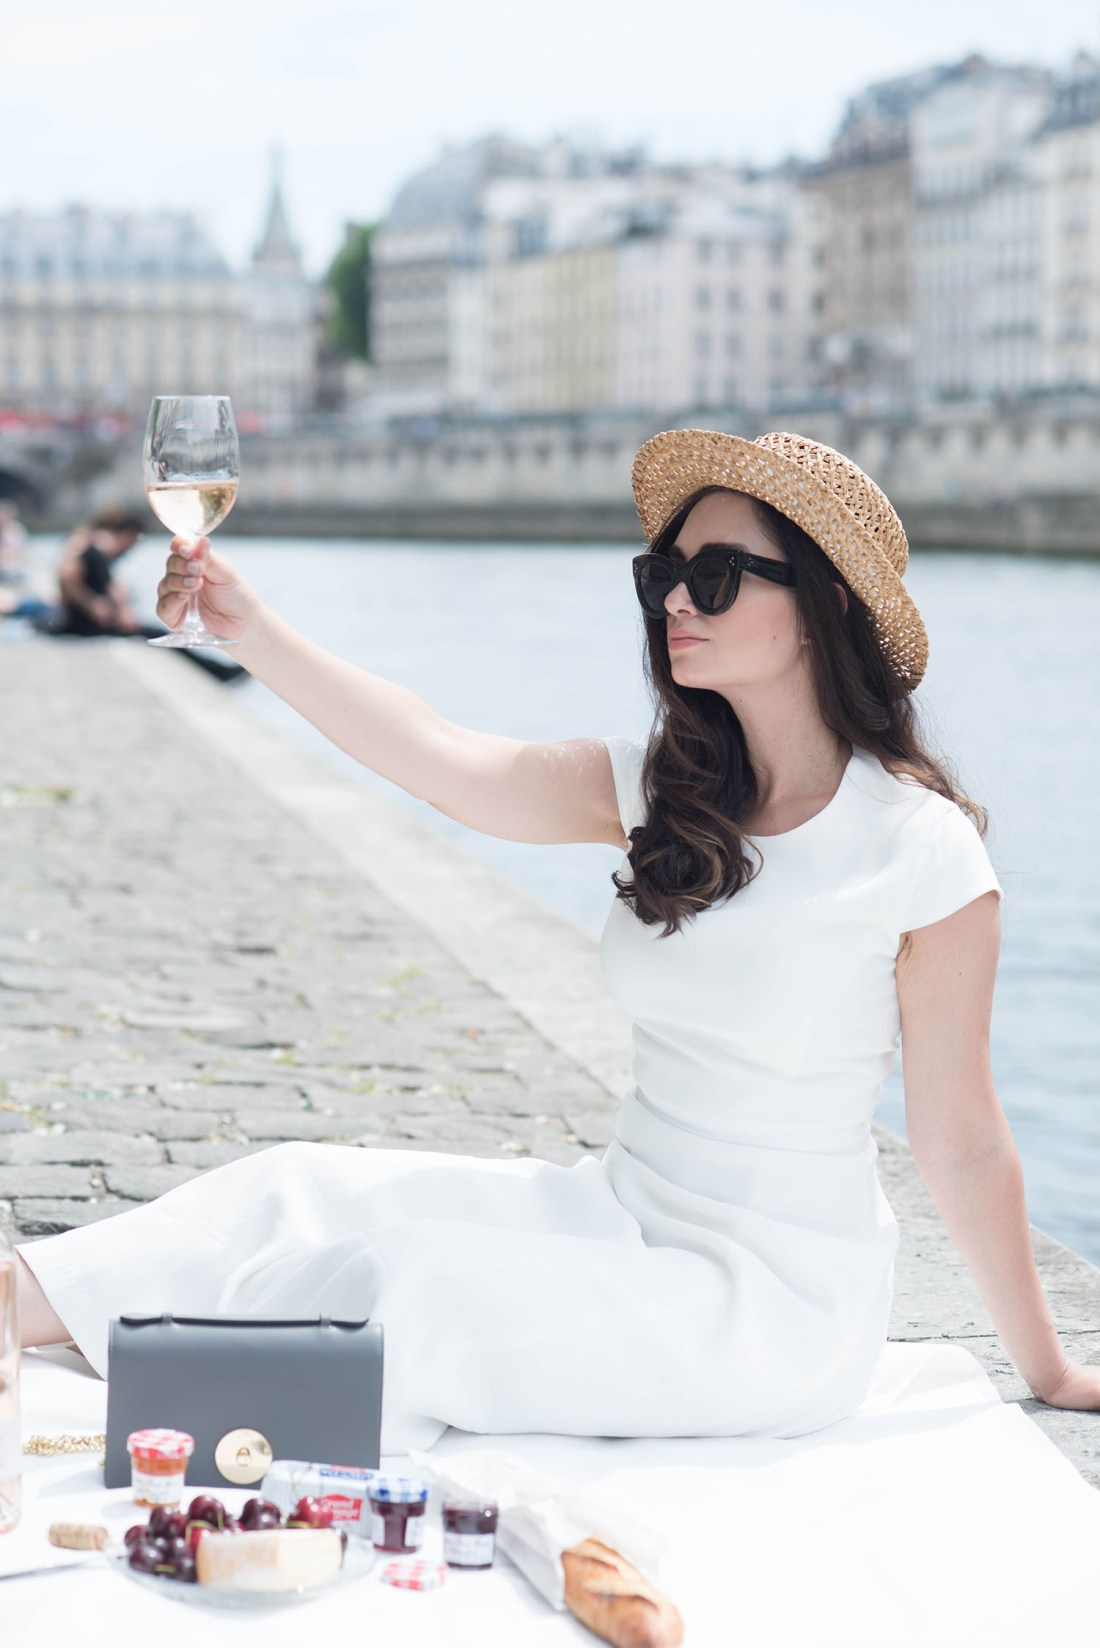 Fashion blogger Cee Fardoe of Coco & Vera celebrates Bastille day in Paris wearing a Krasnova Modiste hat and Ivy & Oak dress